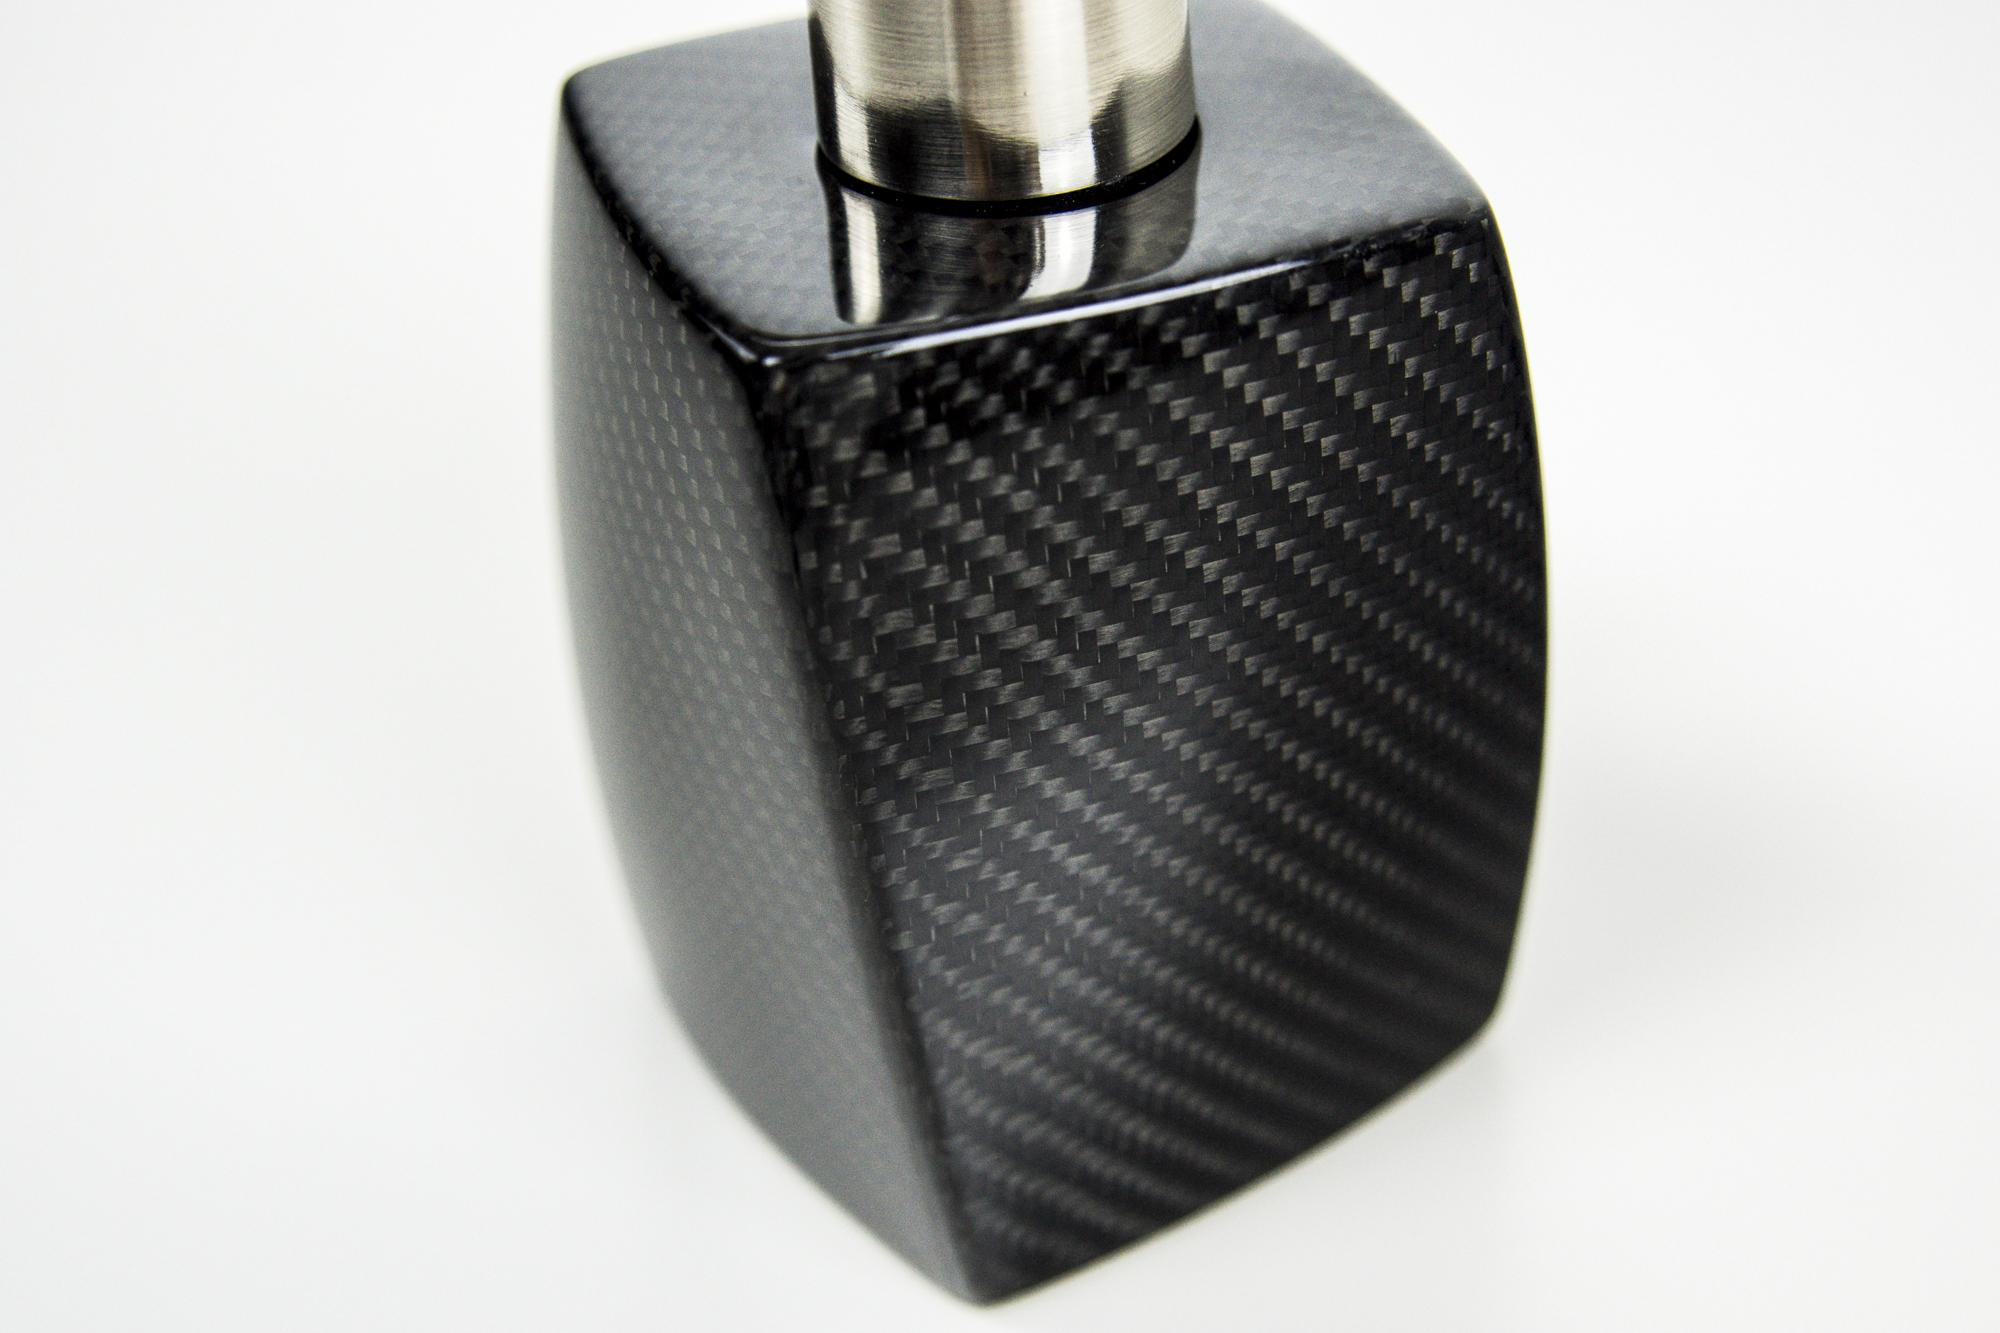 Design Seifenspender Carbon